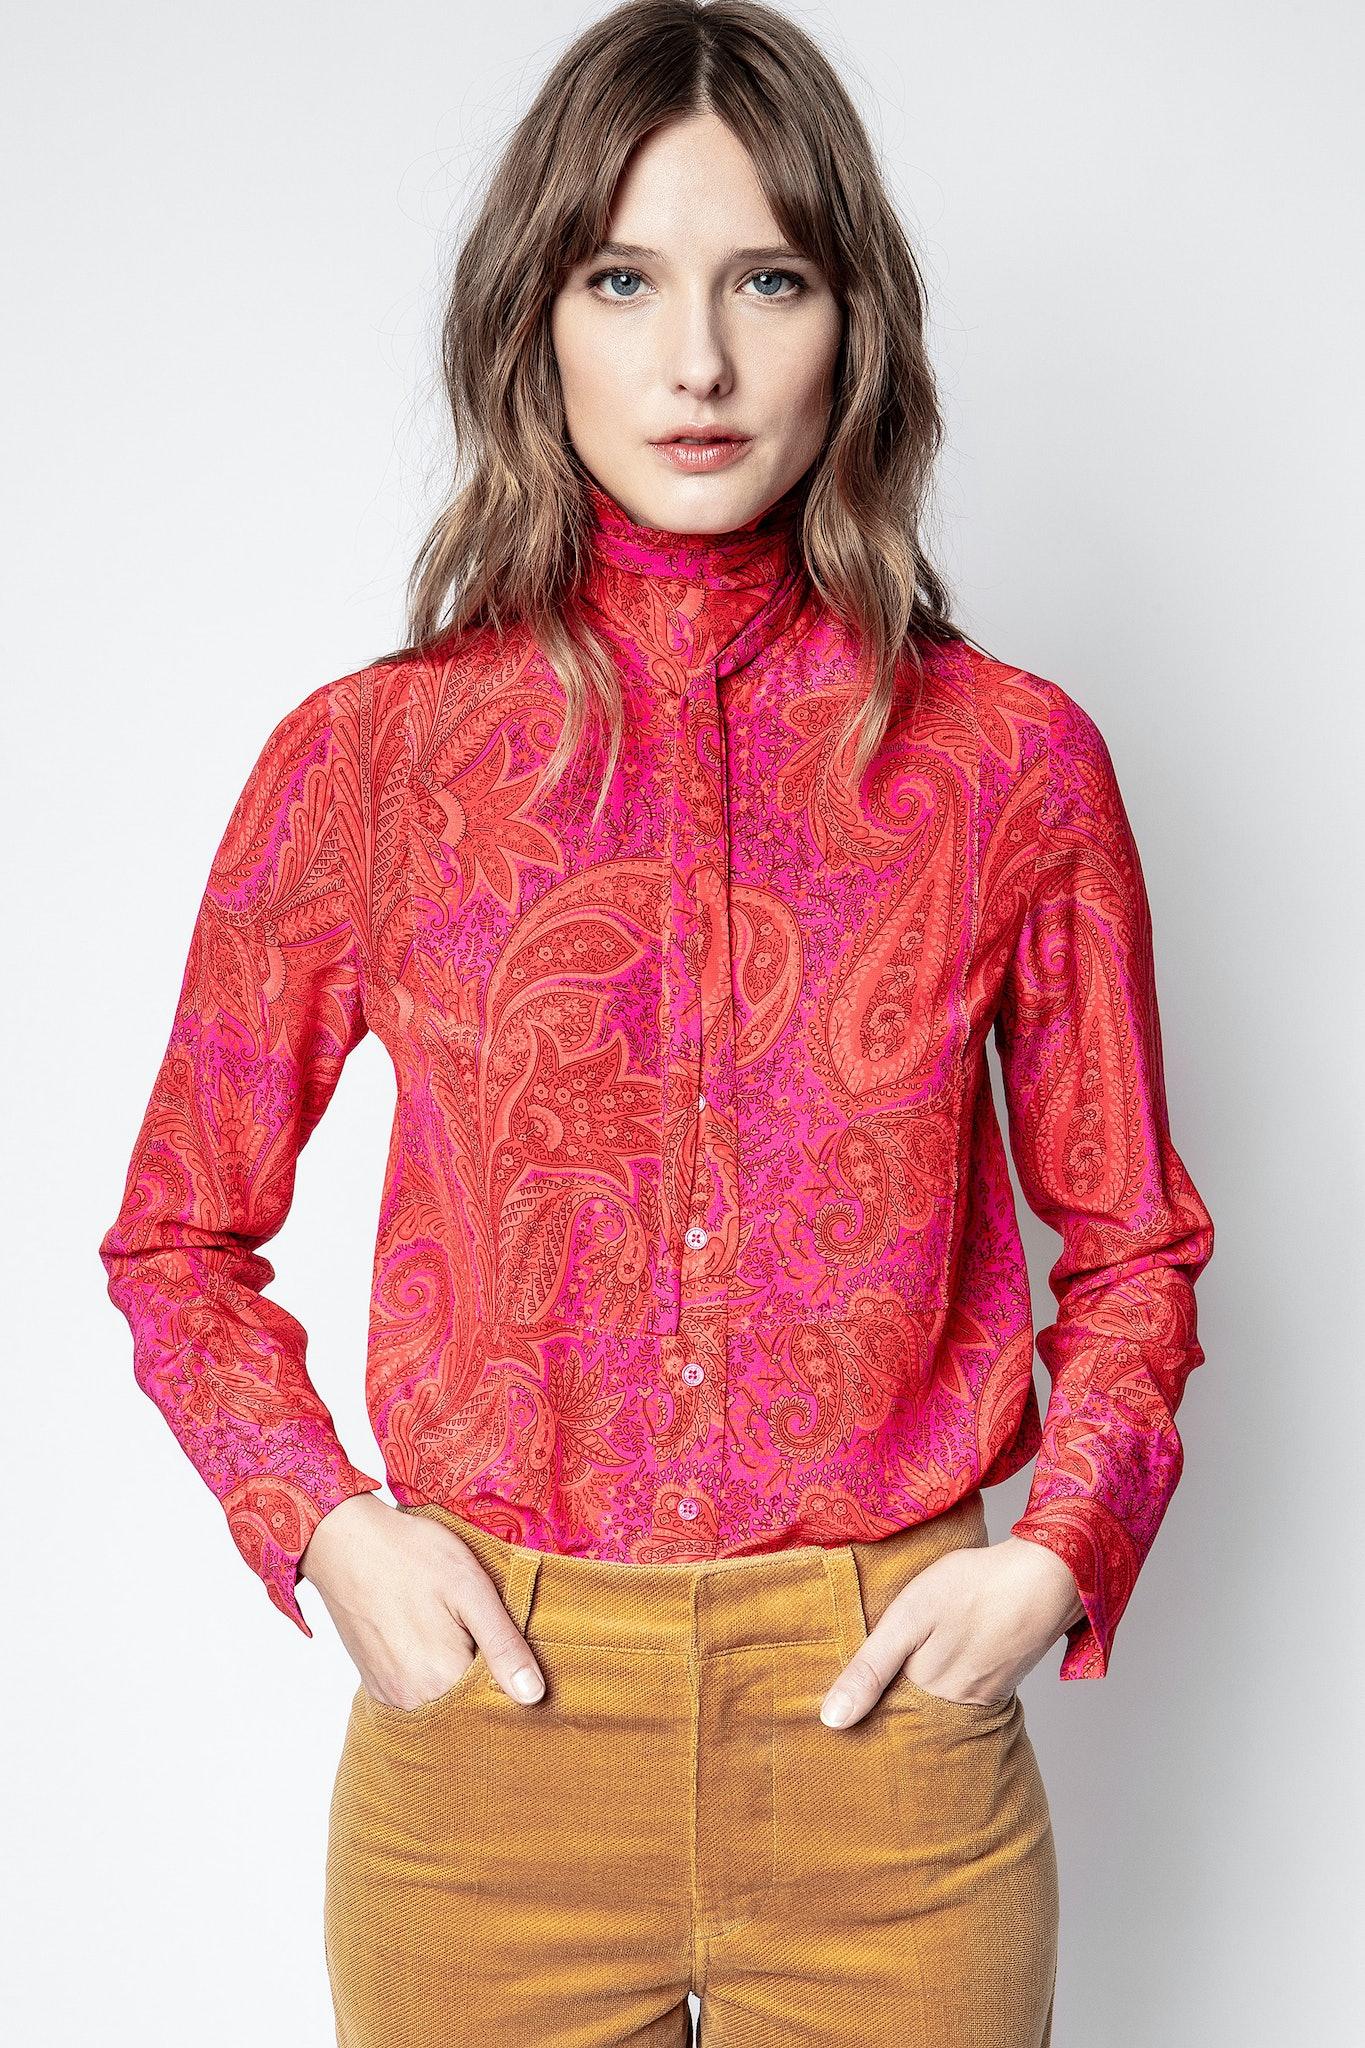 Tessi Paisley Peacock Shirt